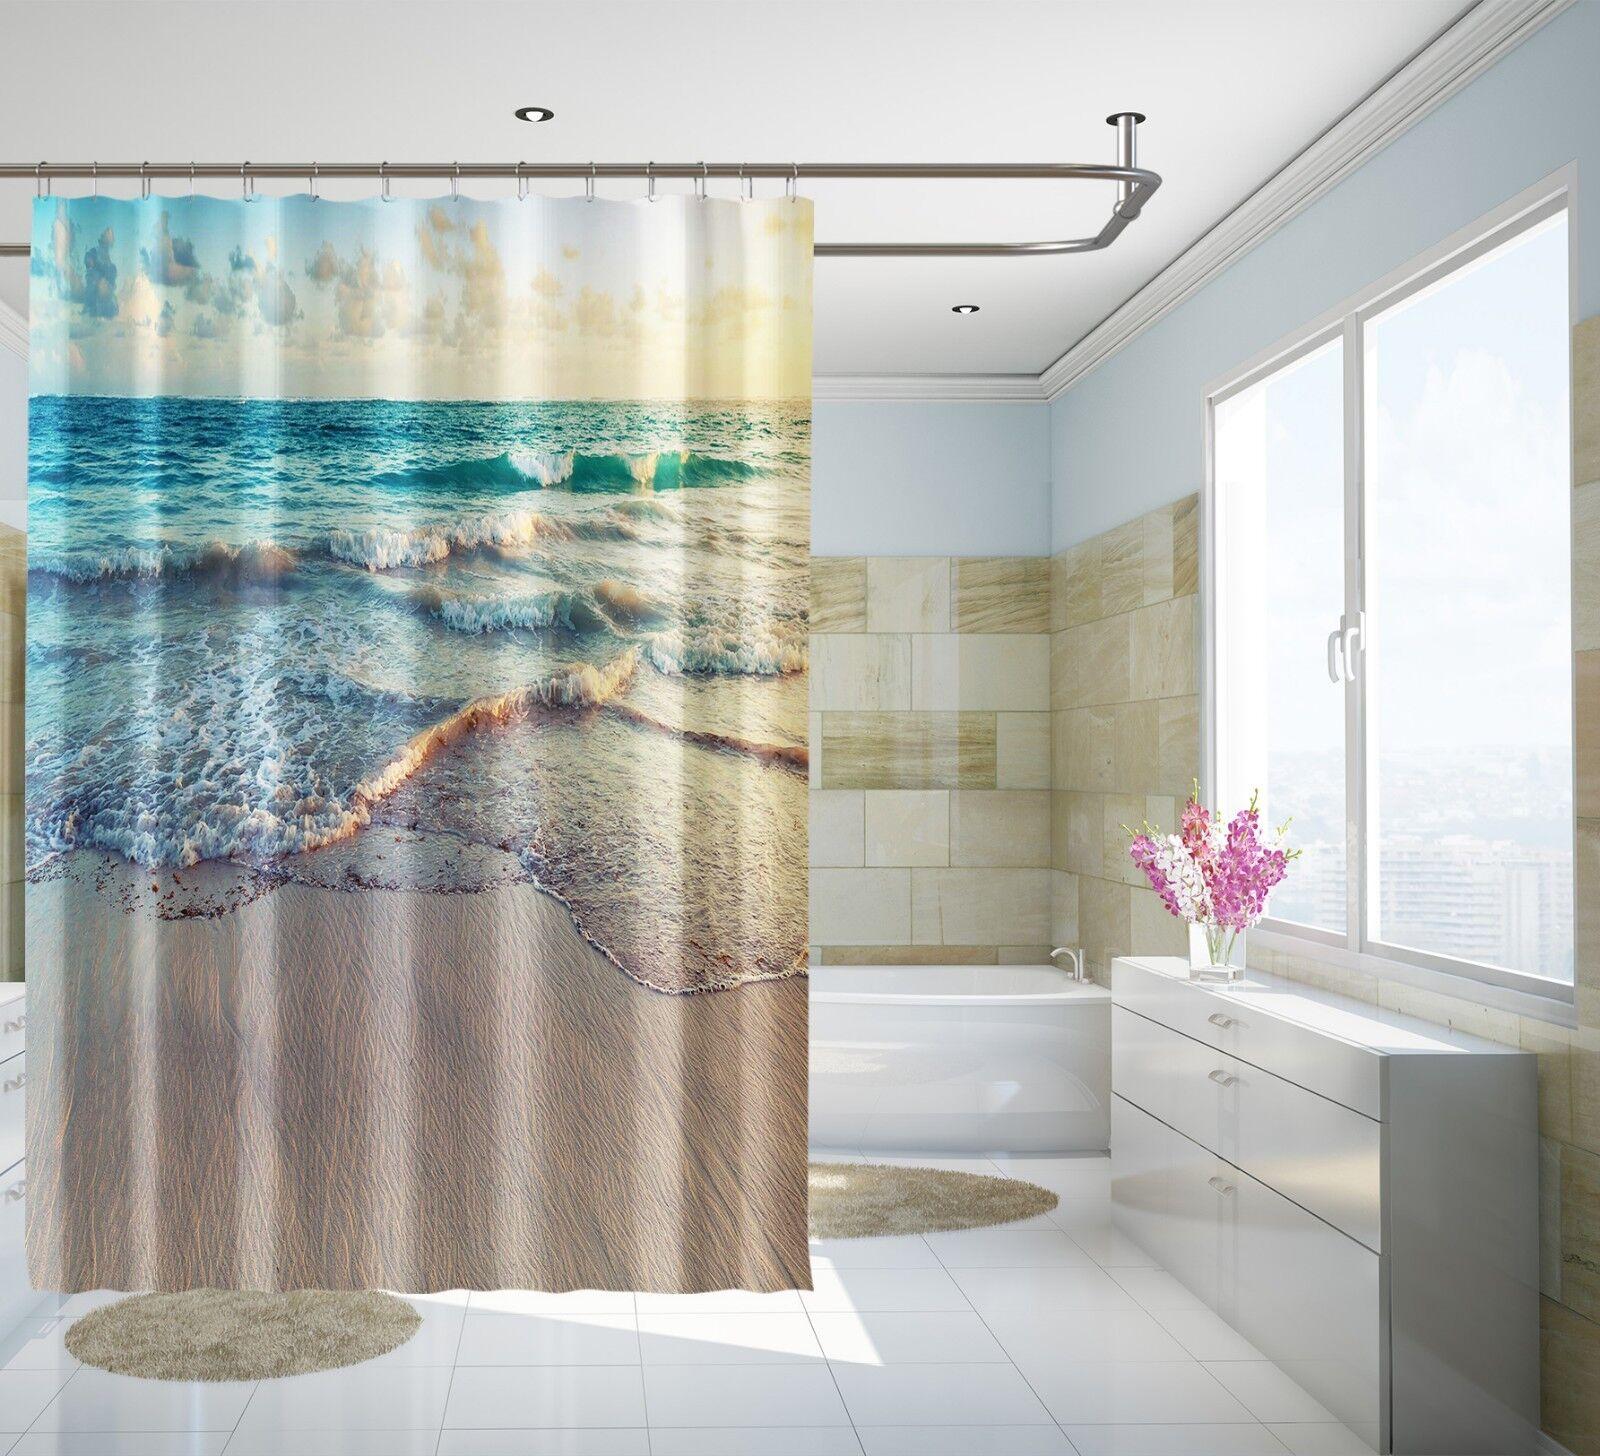 3D Beach Ocean 645 Shower Curtain Waterproof Fiber Bathroom Home Windows Toilet